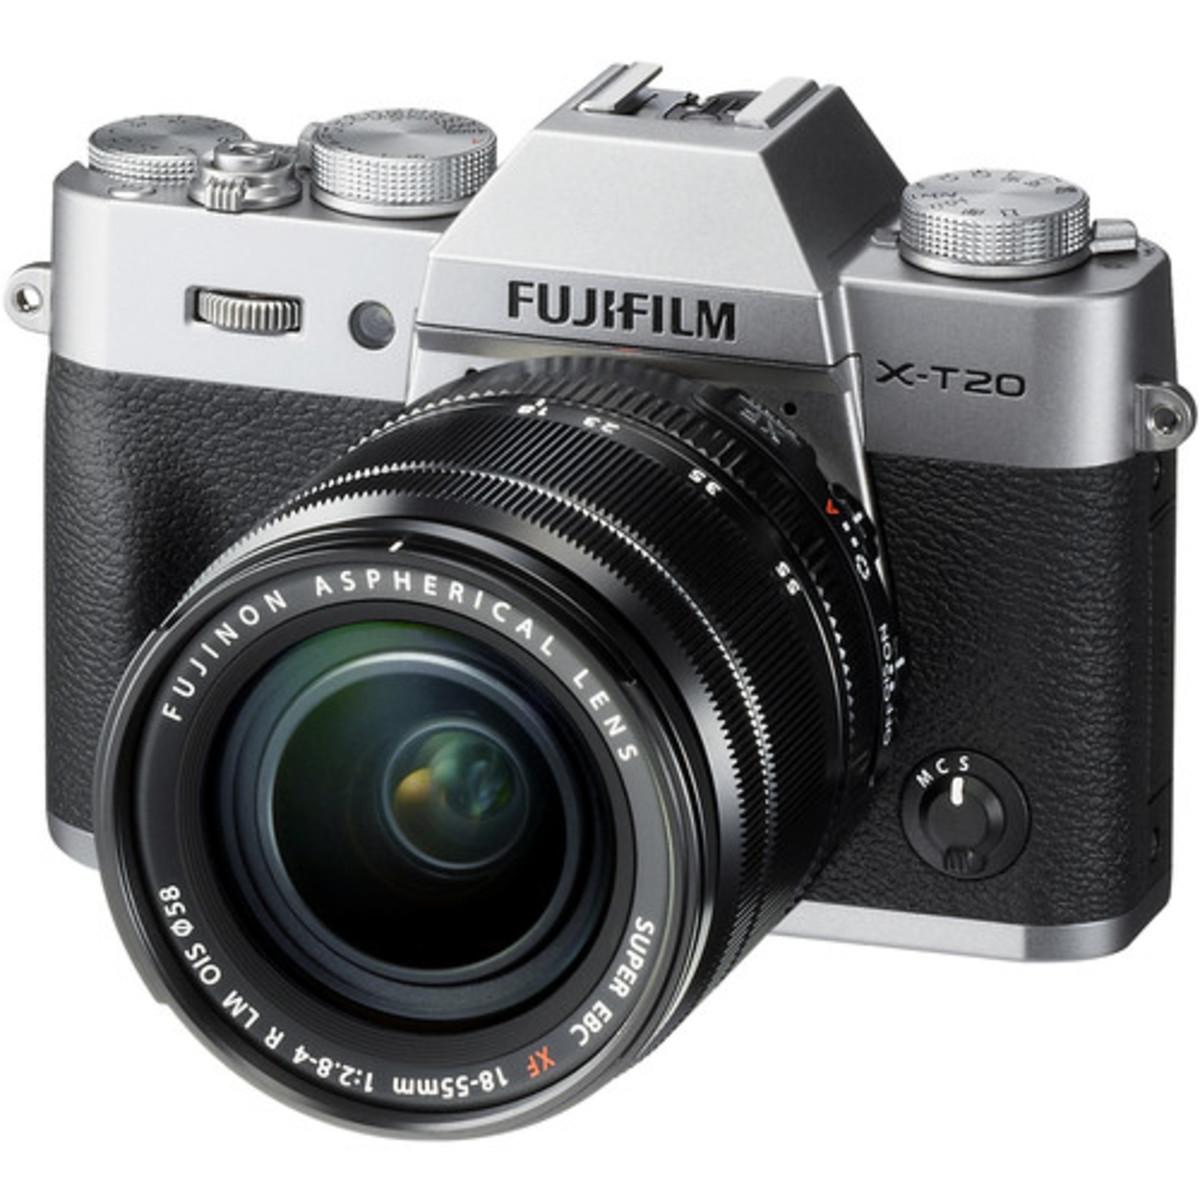 Fujifilm X-T20 Mirrorless Digital Camera with XF 18-55mm Lens - [銀色] (平行進口)